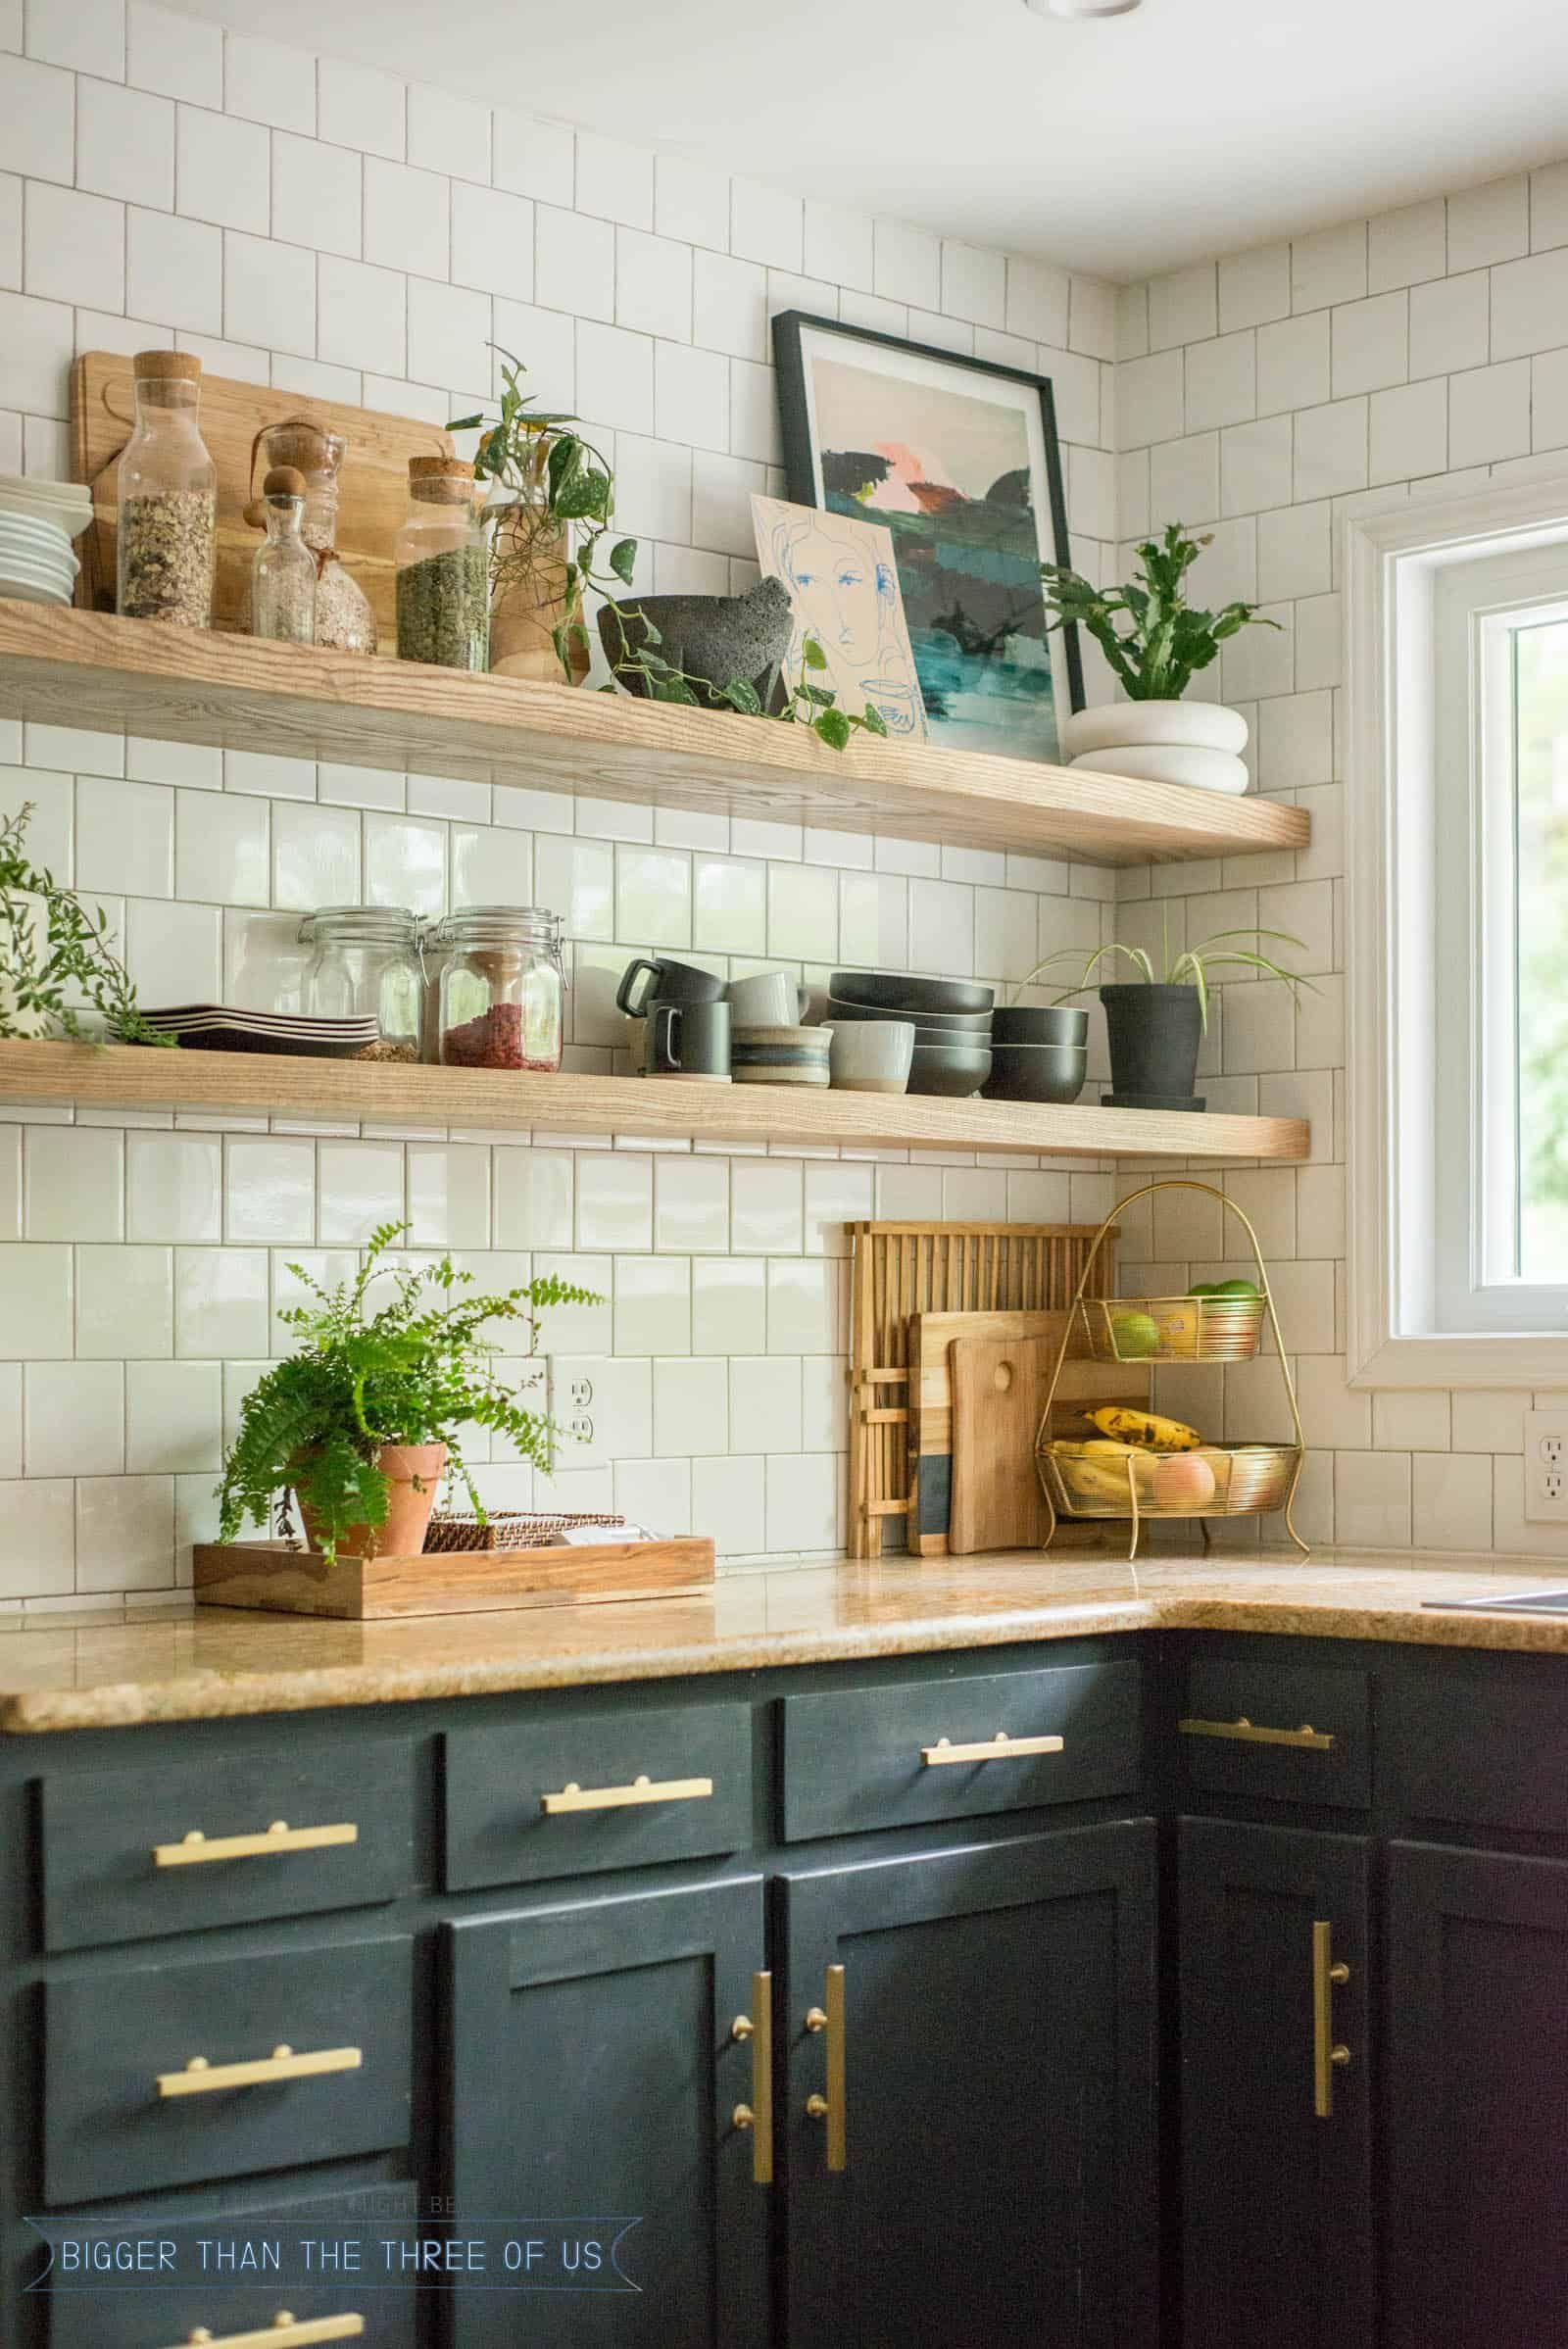 Diy Open Shelving Kitchen Guide In 2020 Floating Shelves Kitchen